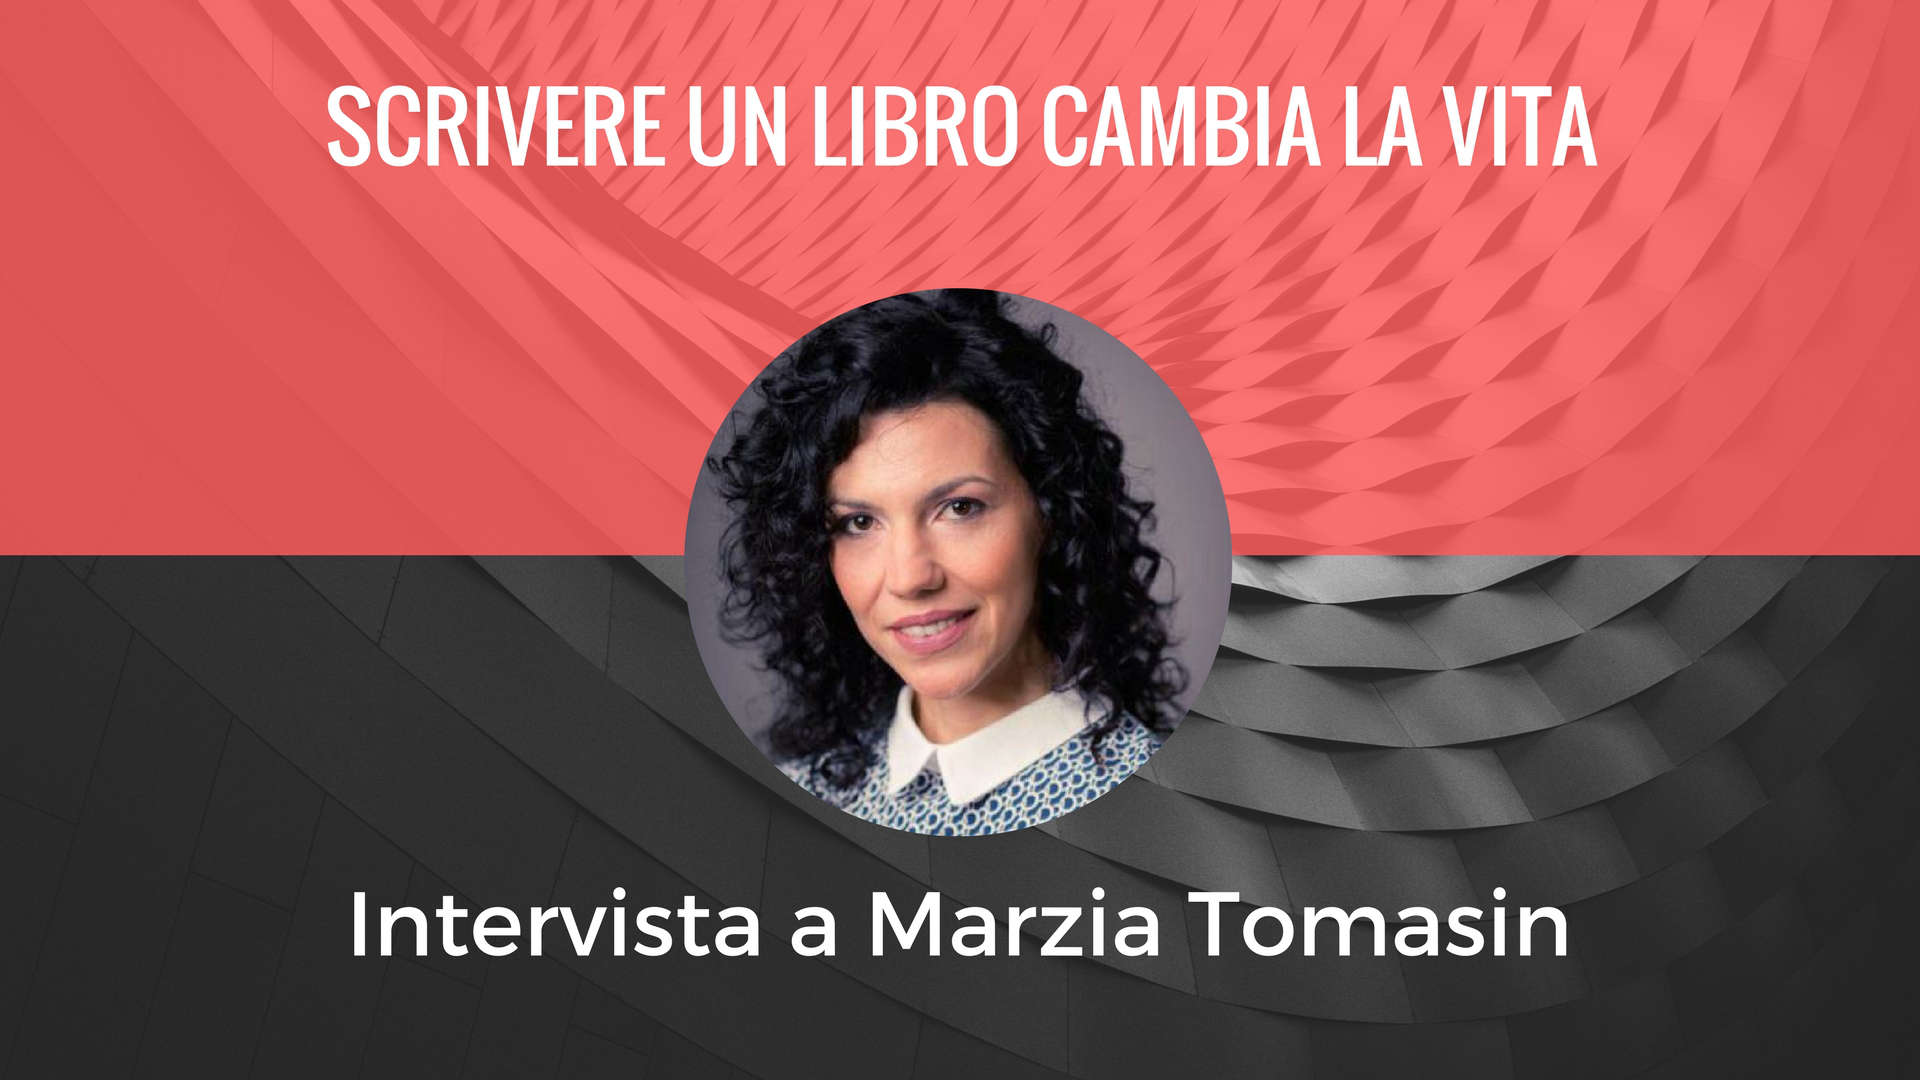 Intervista a Marzia Tomasin